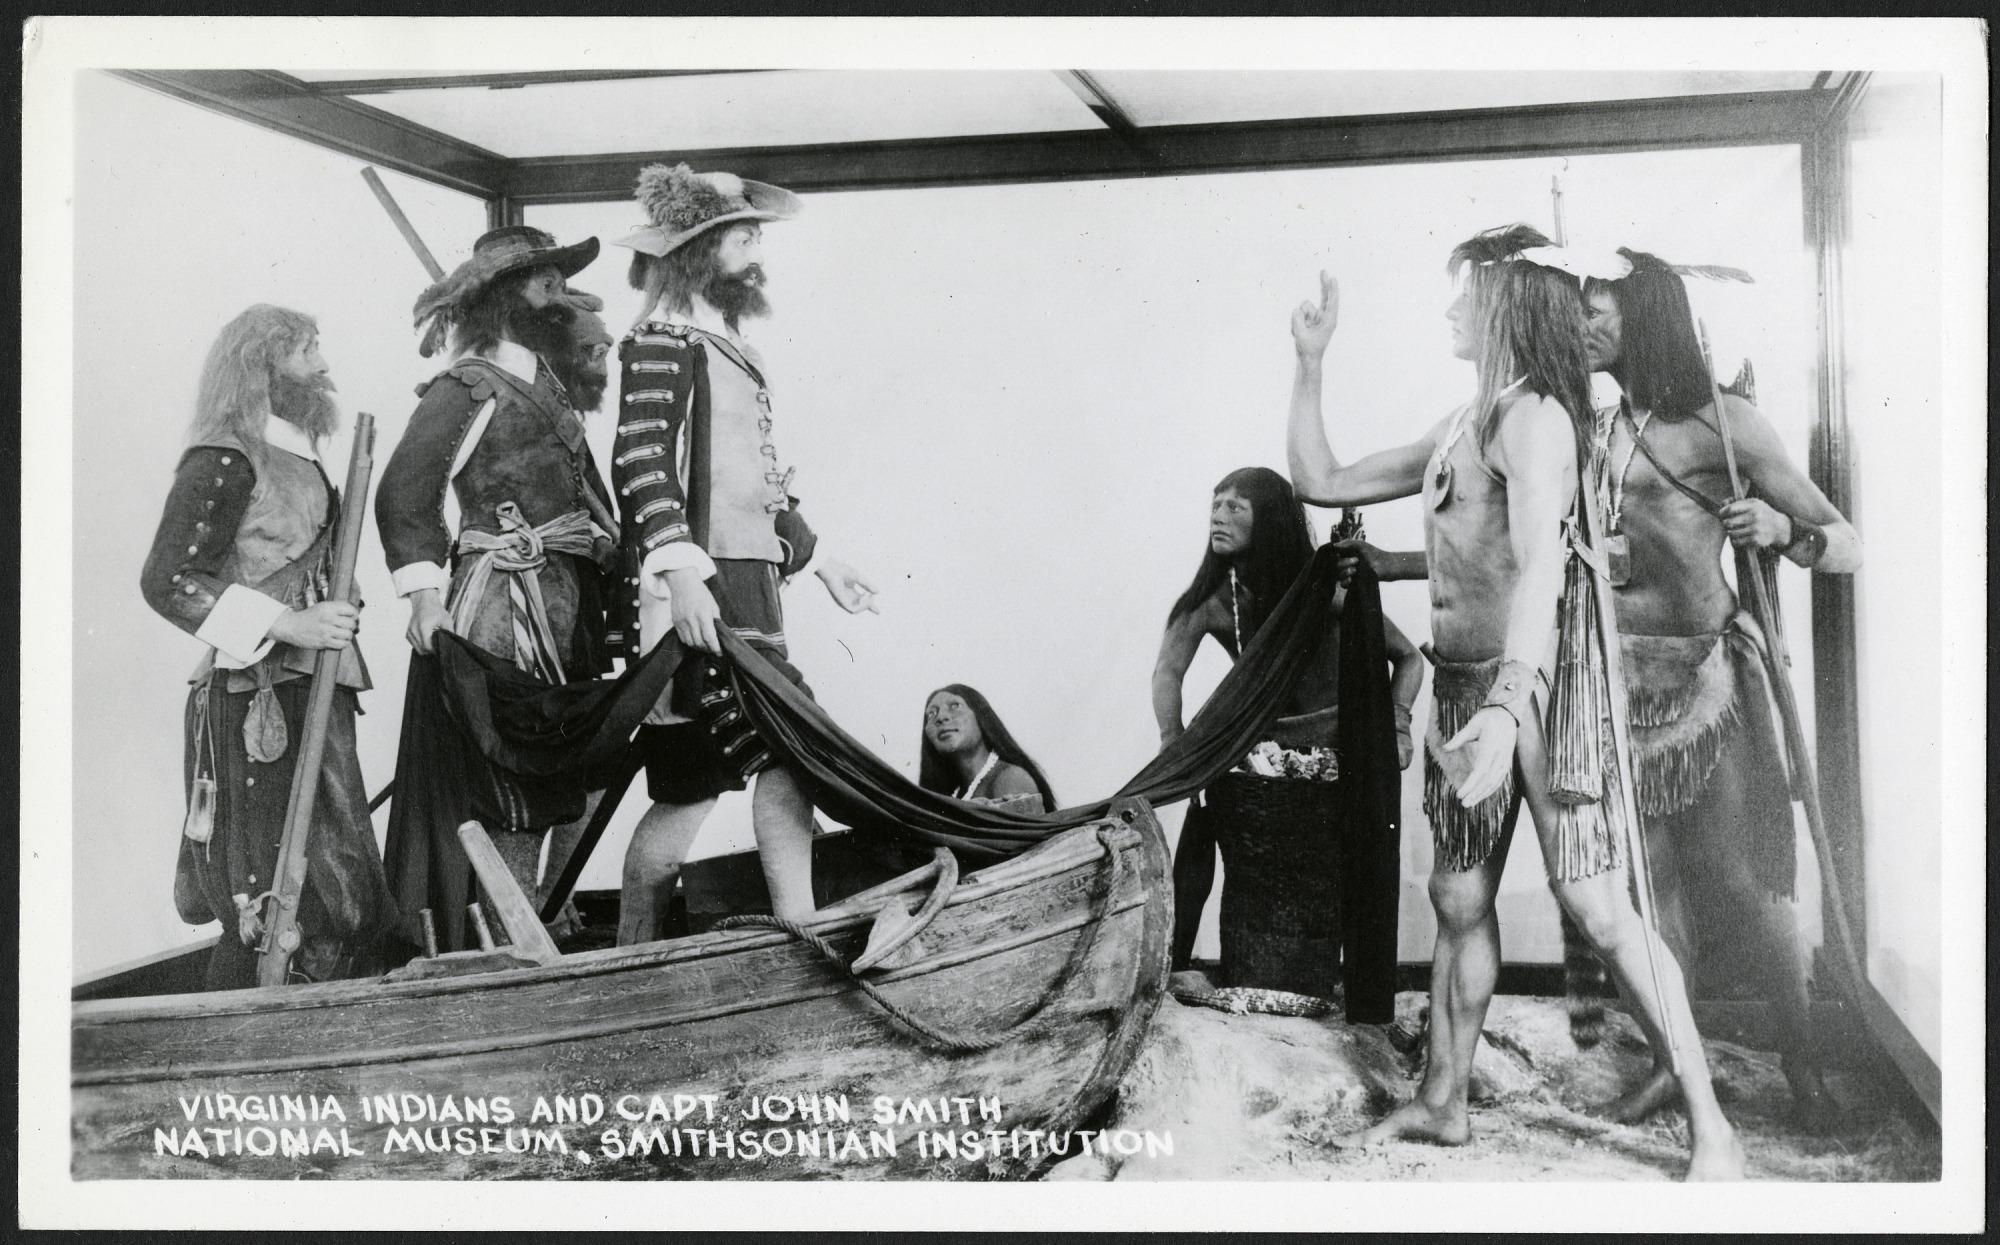 Postcard of Virginia Indians and Captain John Smith